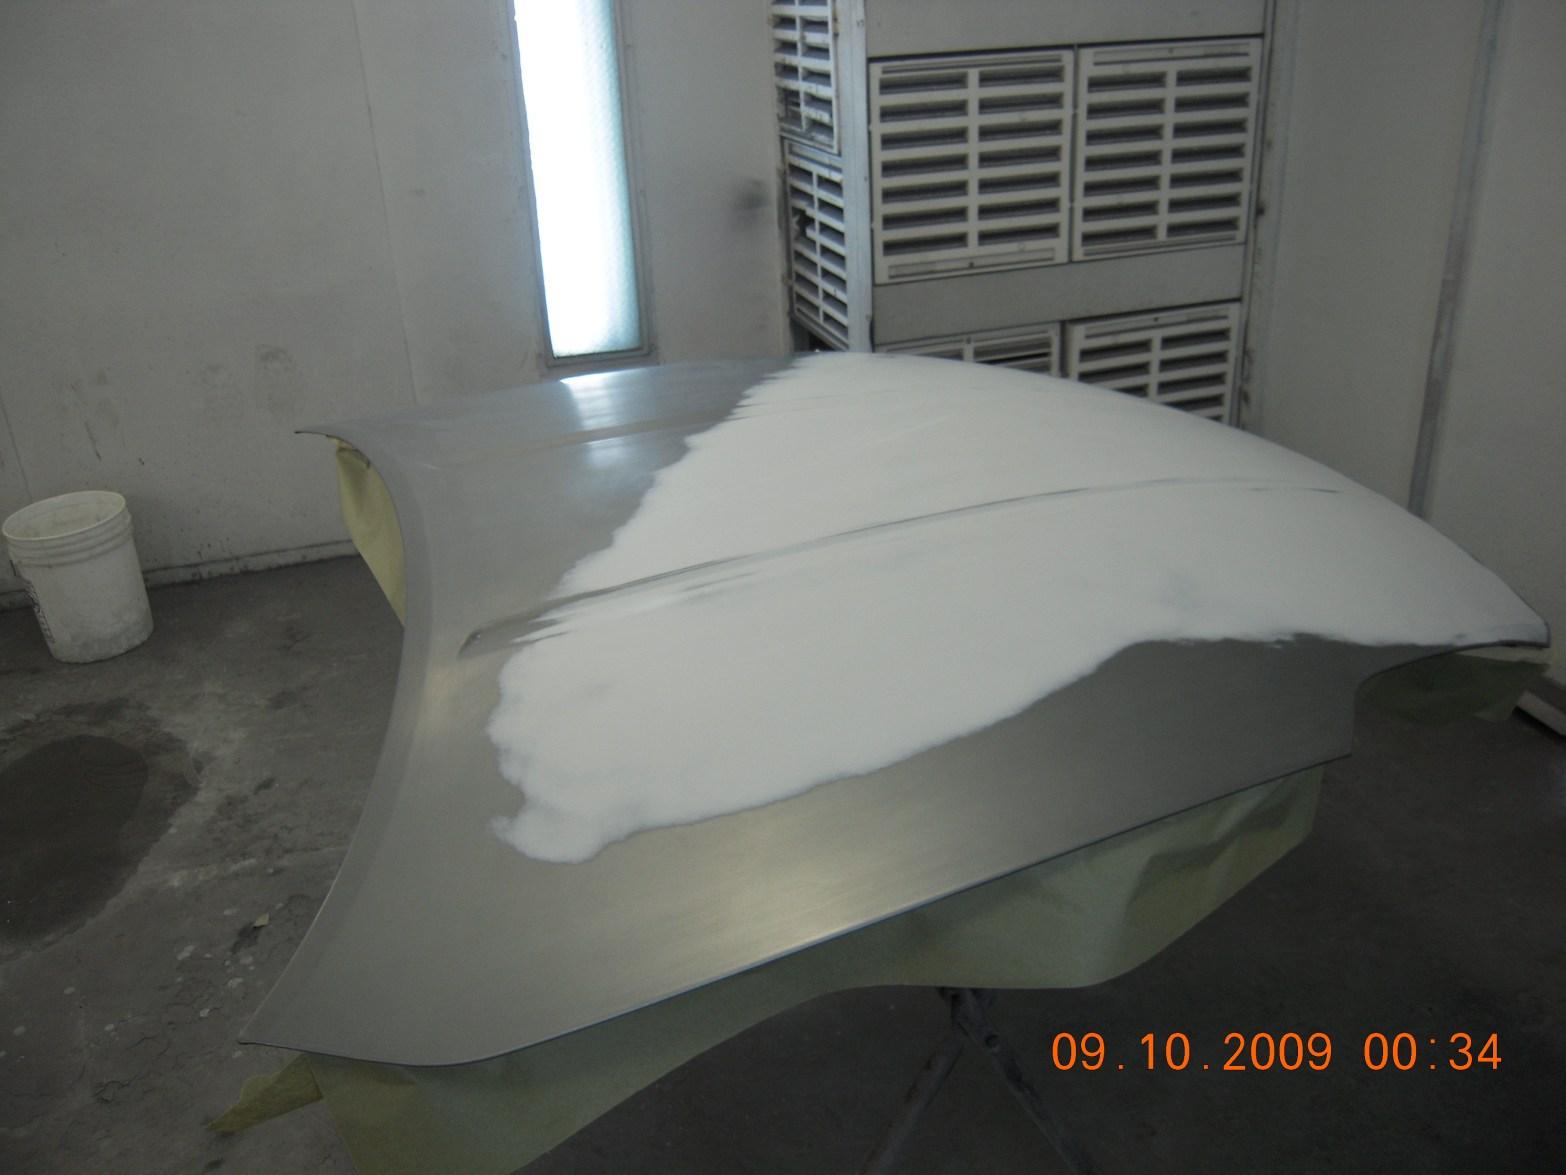 west-coast-body-and-paint-flat-black-nissan-350z-7